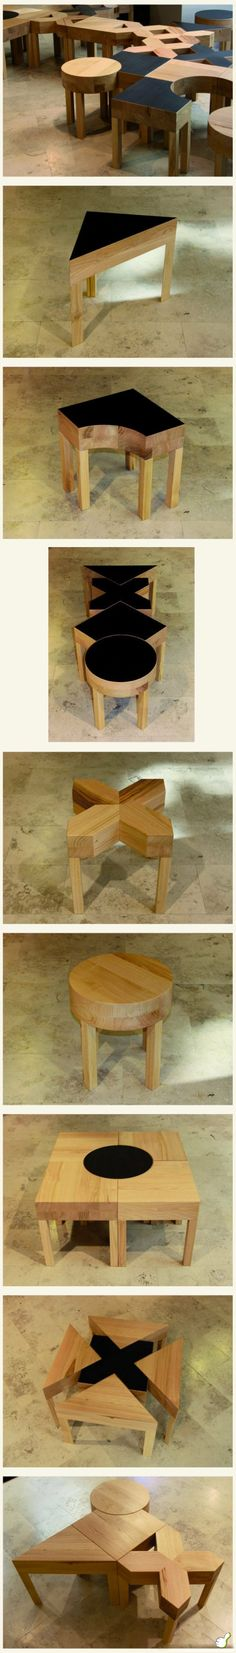 Flexible tables